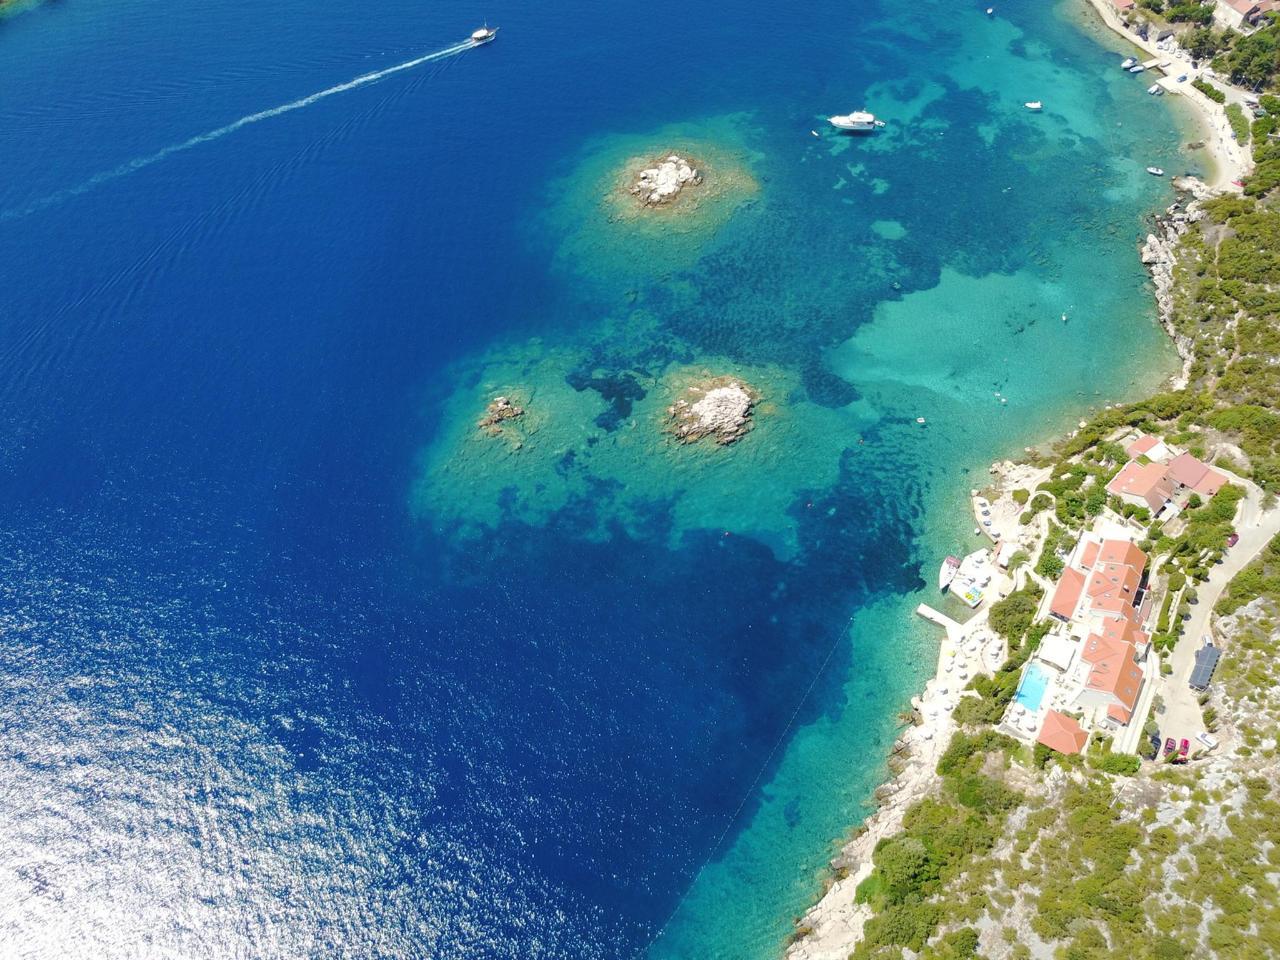 sipan-island-croatia-aerial-view